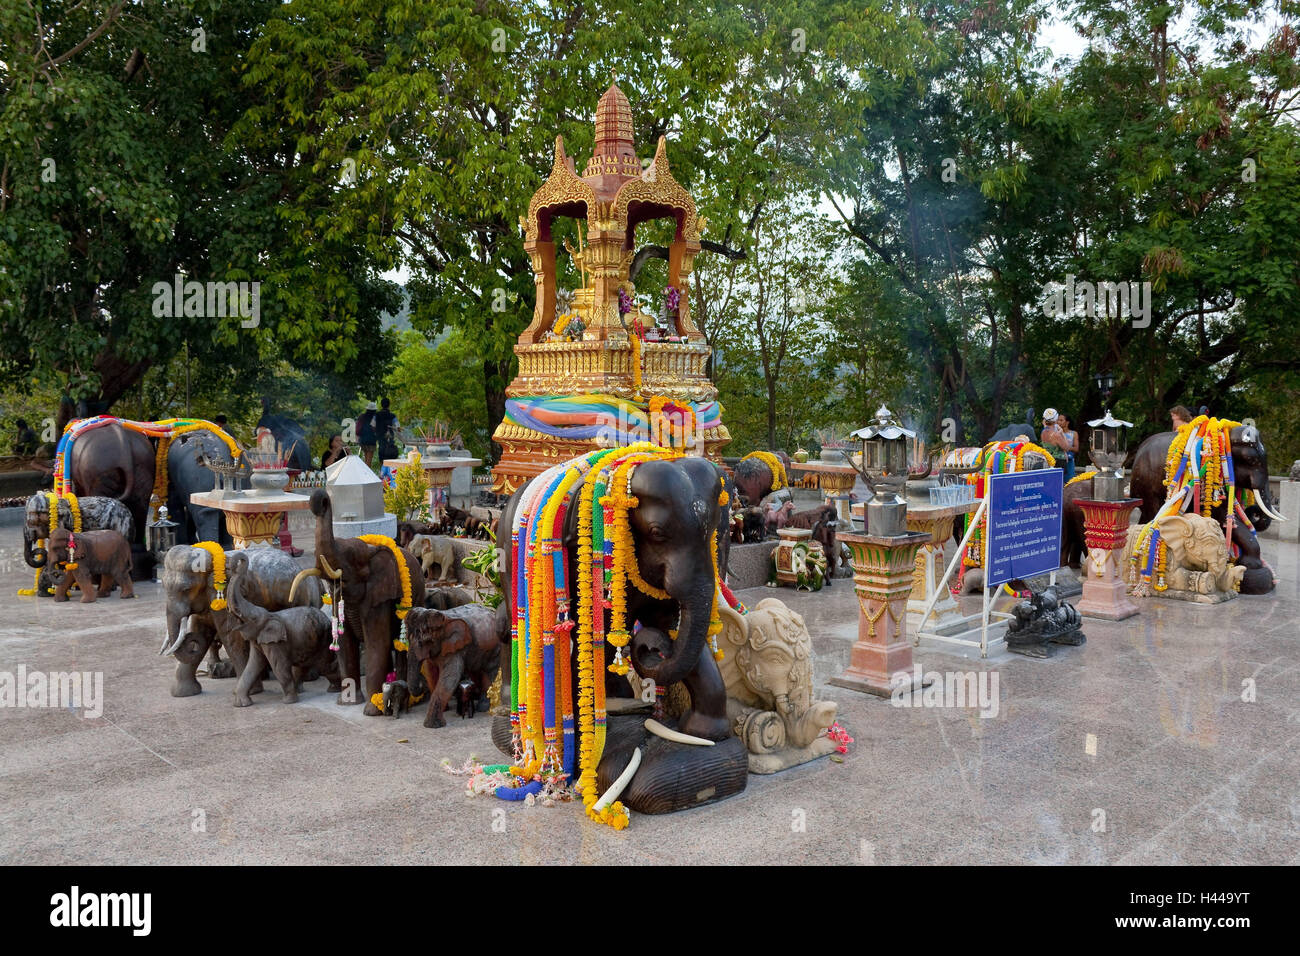 Thailand, Phuket, Cape Laem Promthep, toiletries, elephant figurines, - Stock Image